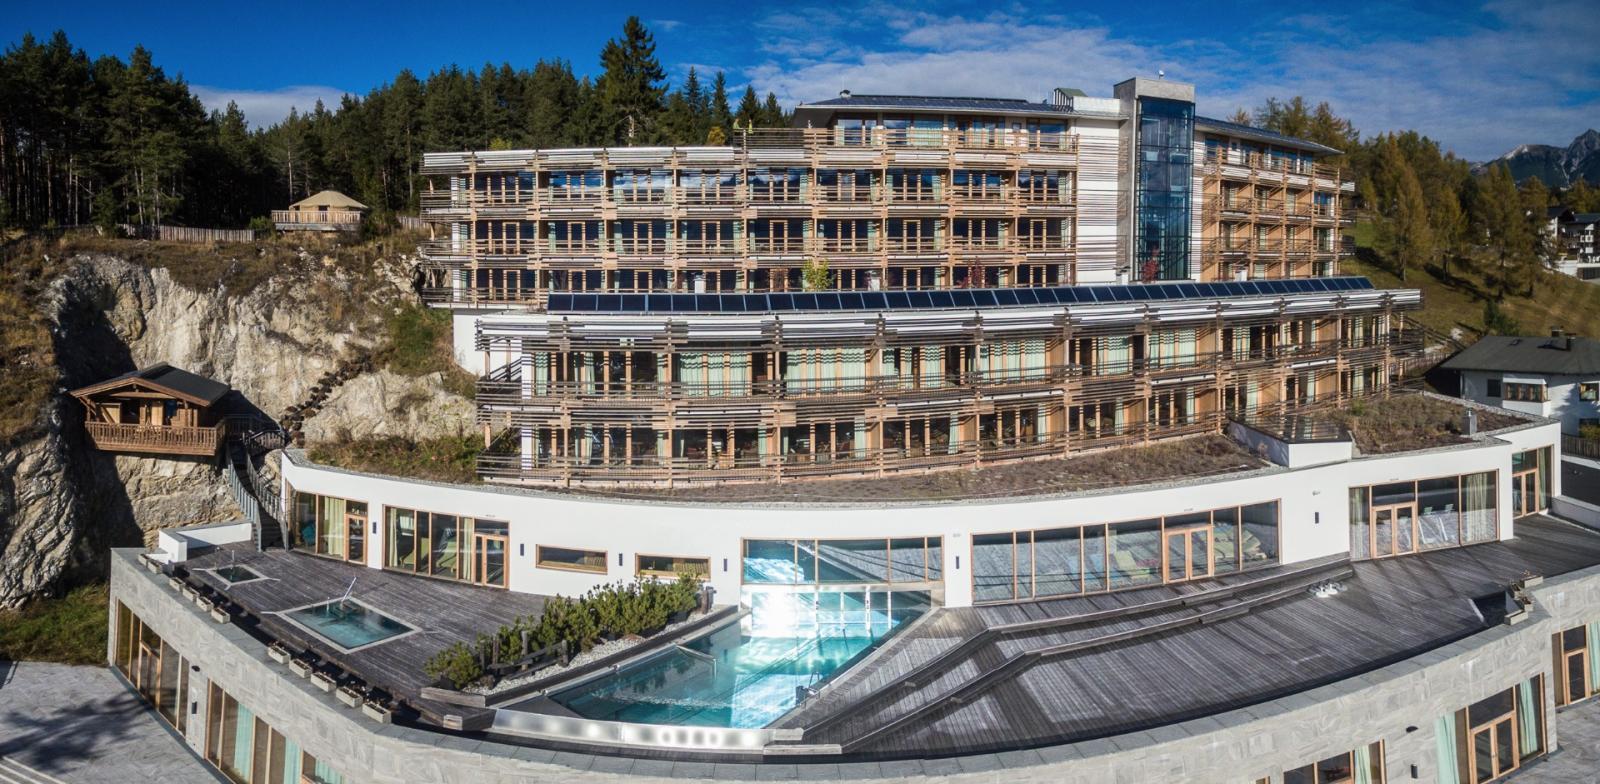 Nidum casual luxury hotel m sern hotelbewertung for Luxury hotel guide